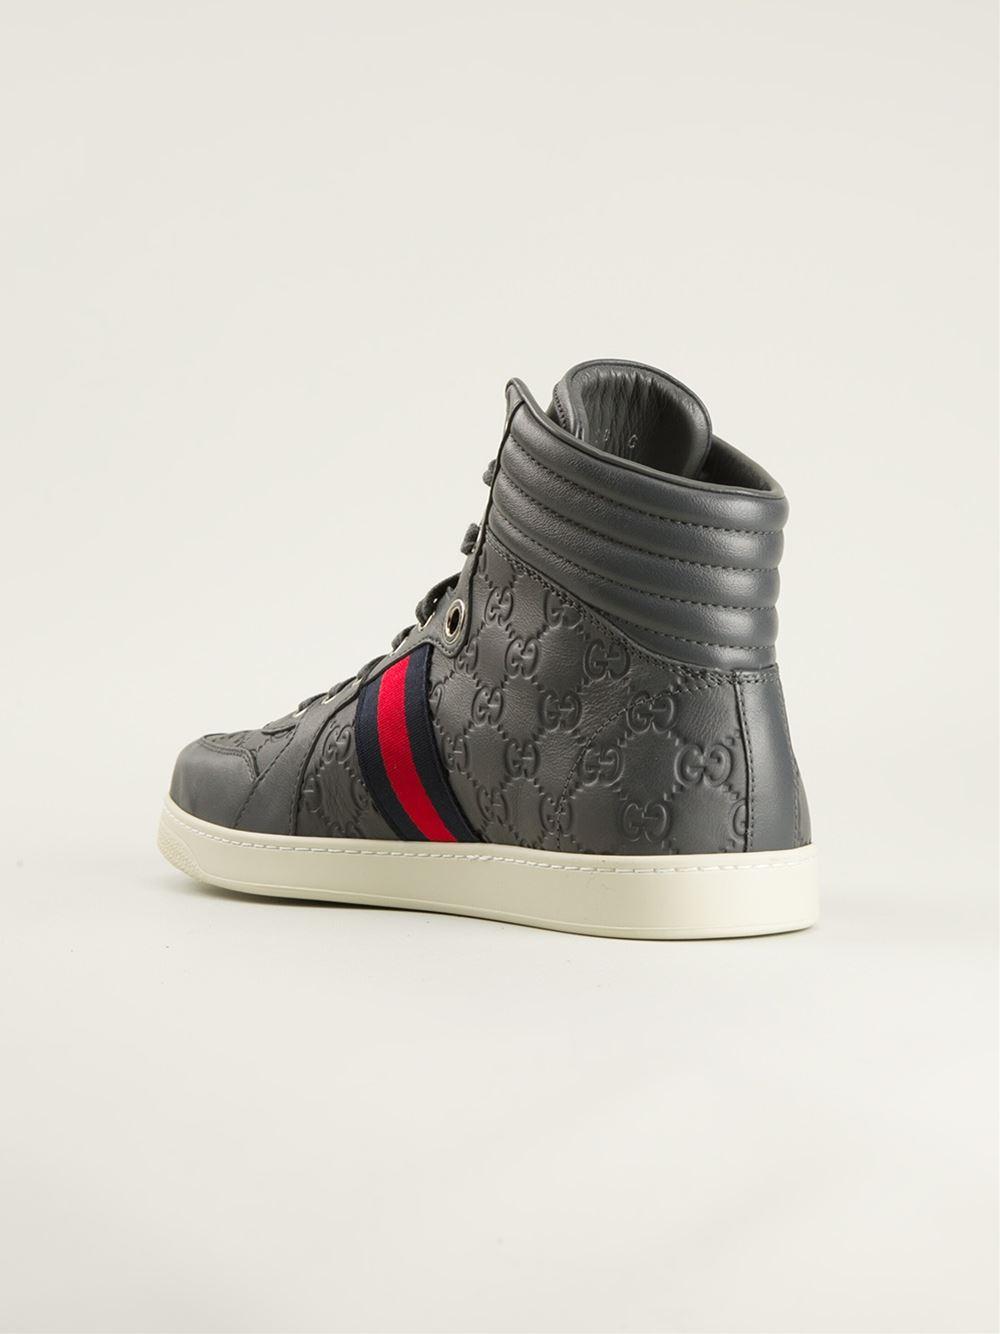 dca0efe3eb3 Gucci Monogram Sneakers in Gray for Men - Lyst